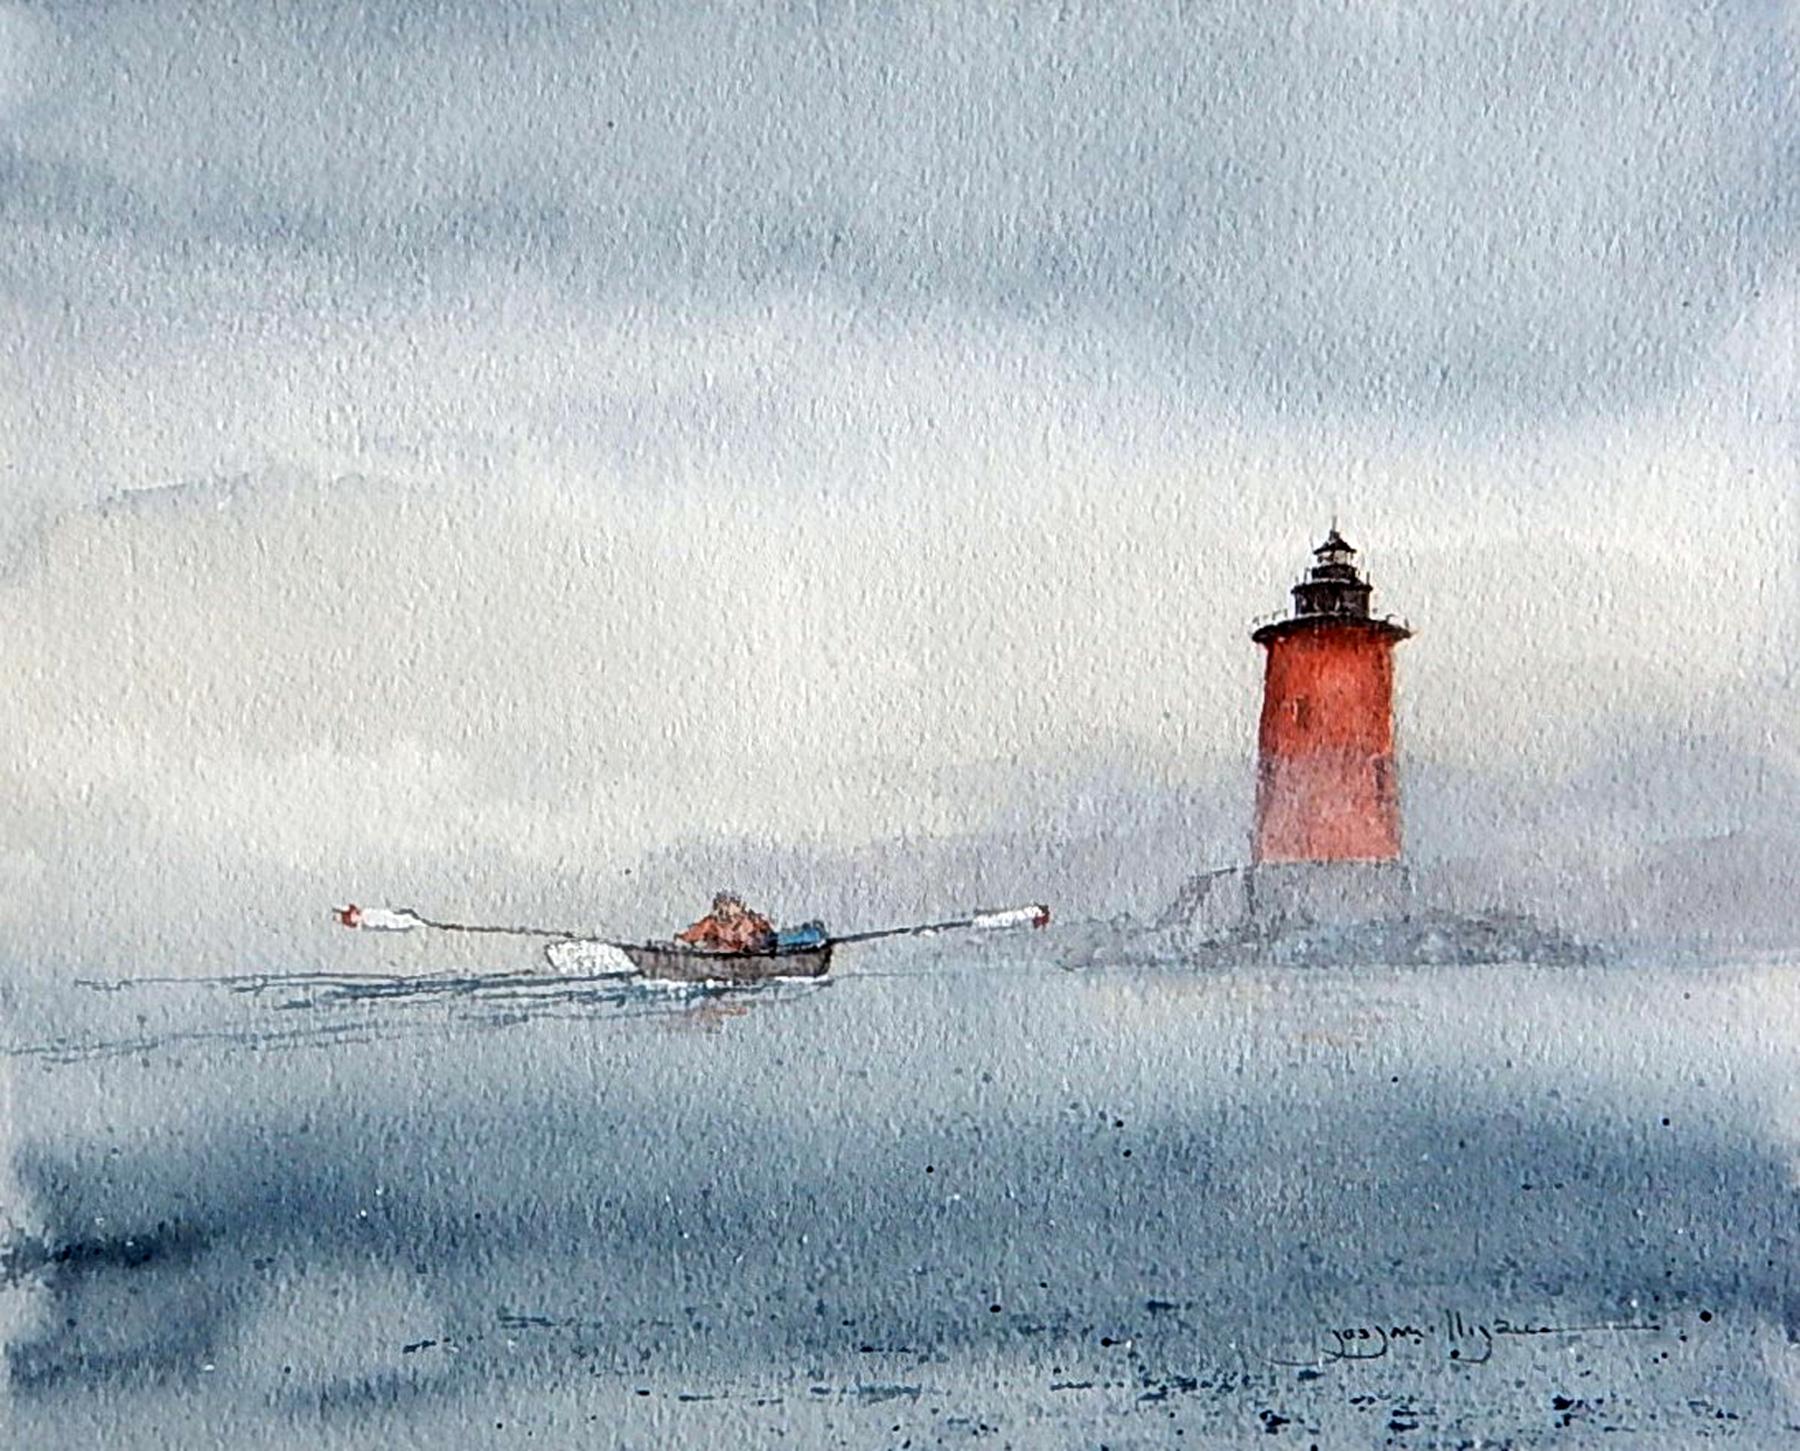 Artist Joe Milligan